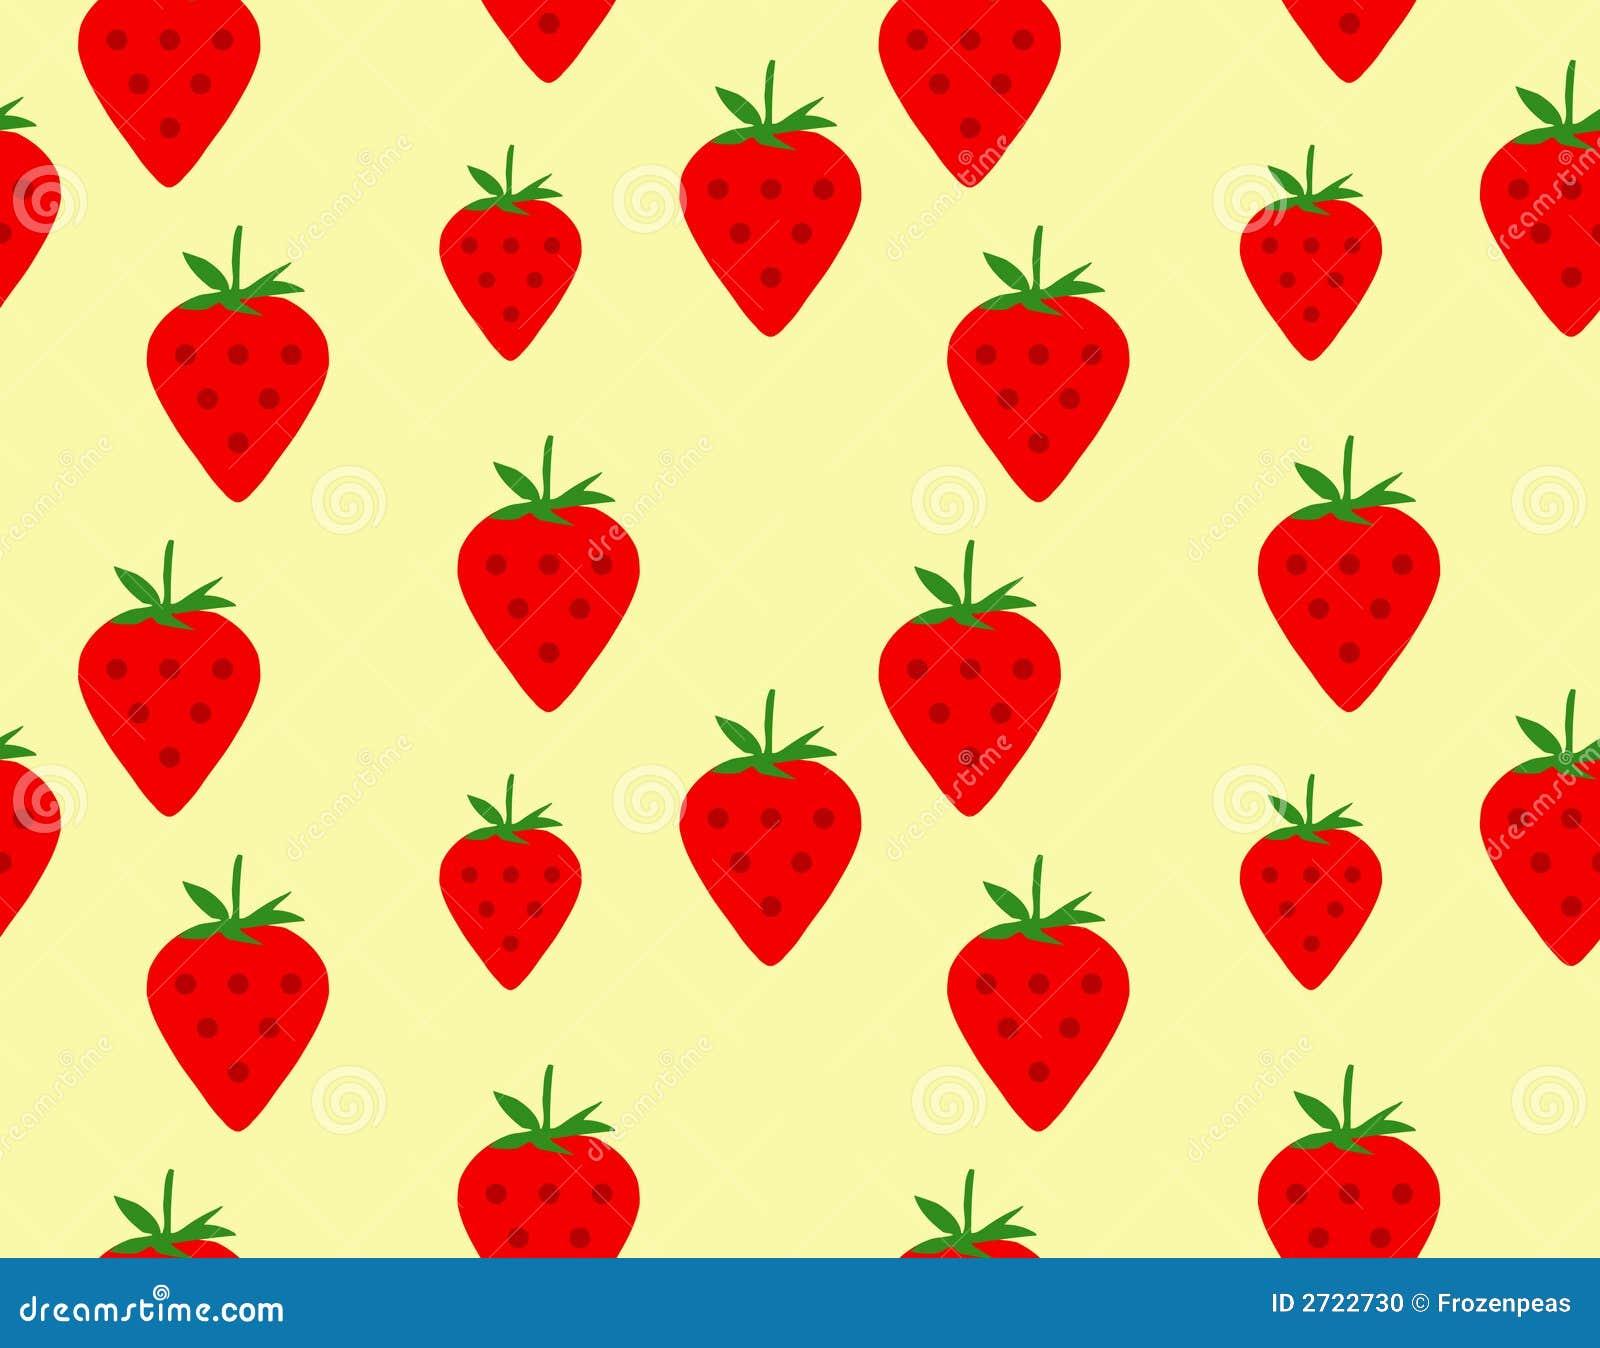 kawaii strawberry wallpaper vintage - photo #18